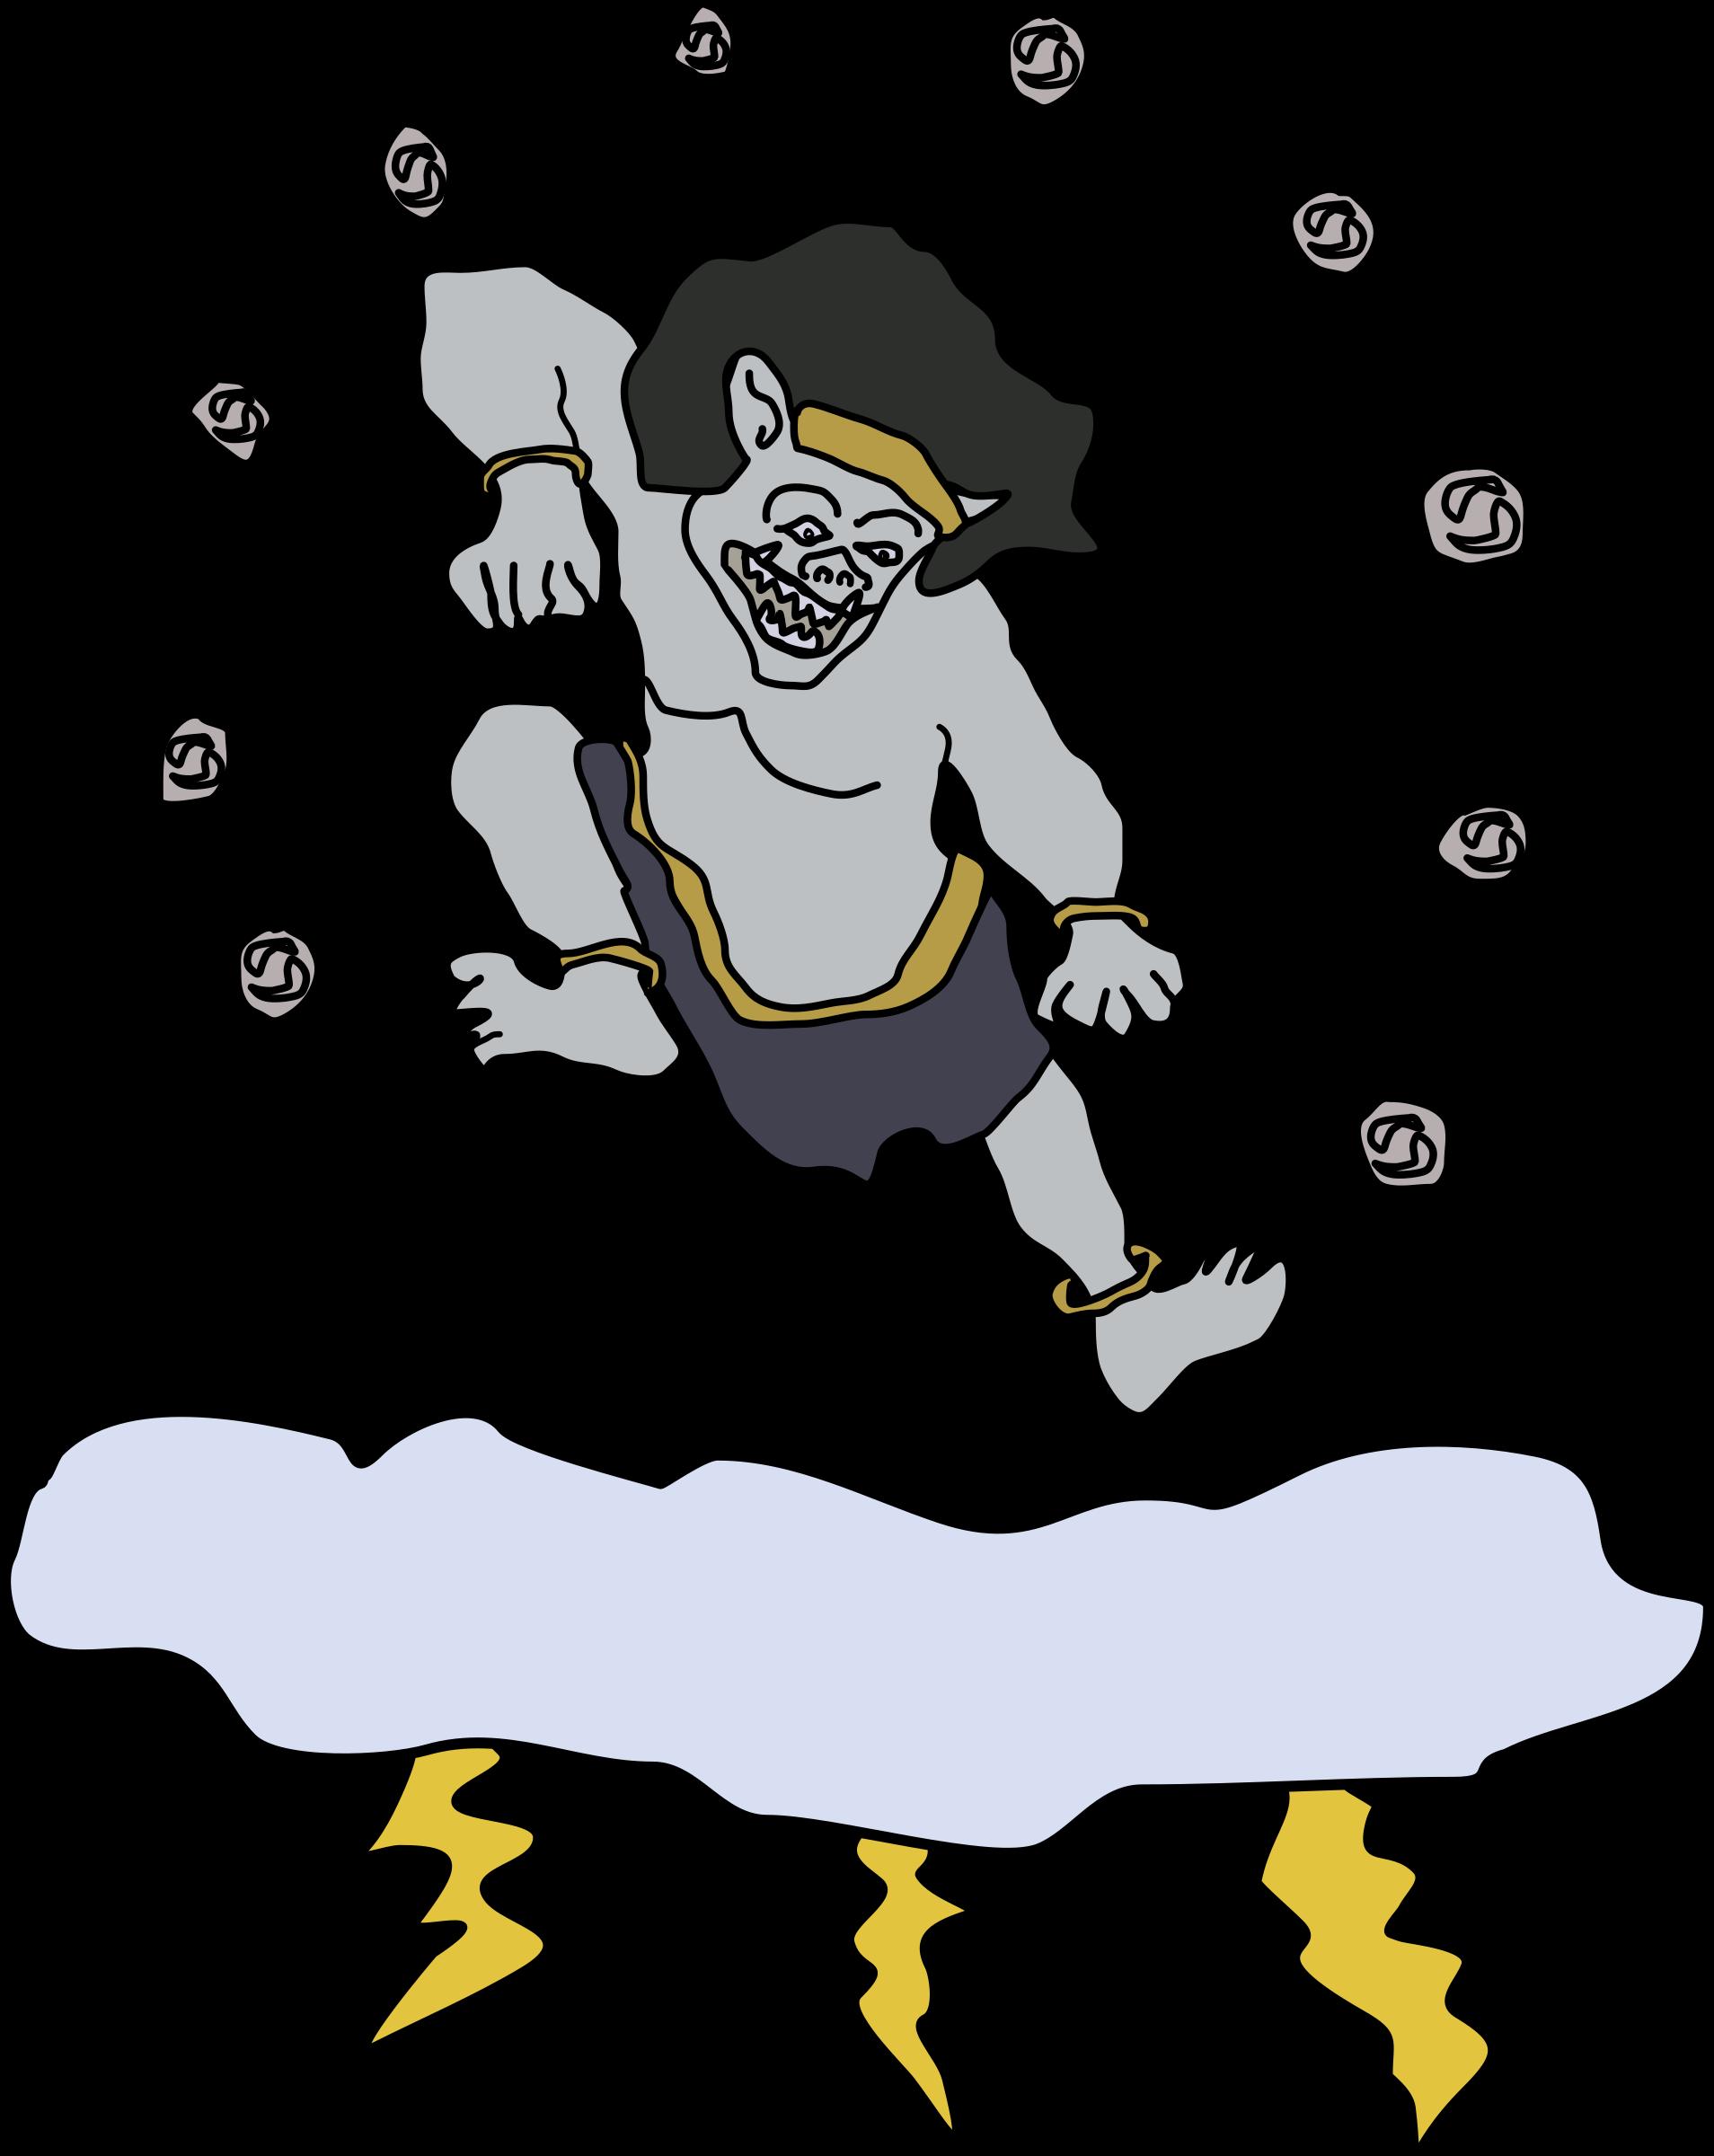 Raijin - The God of Thunder by j4p4n